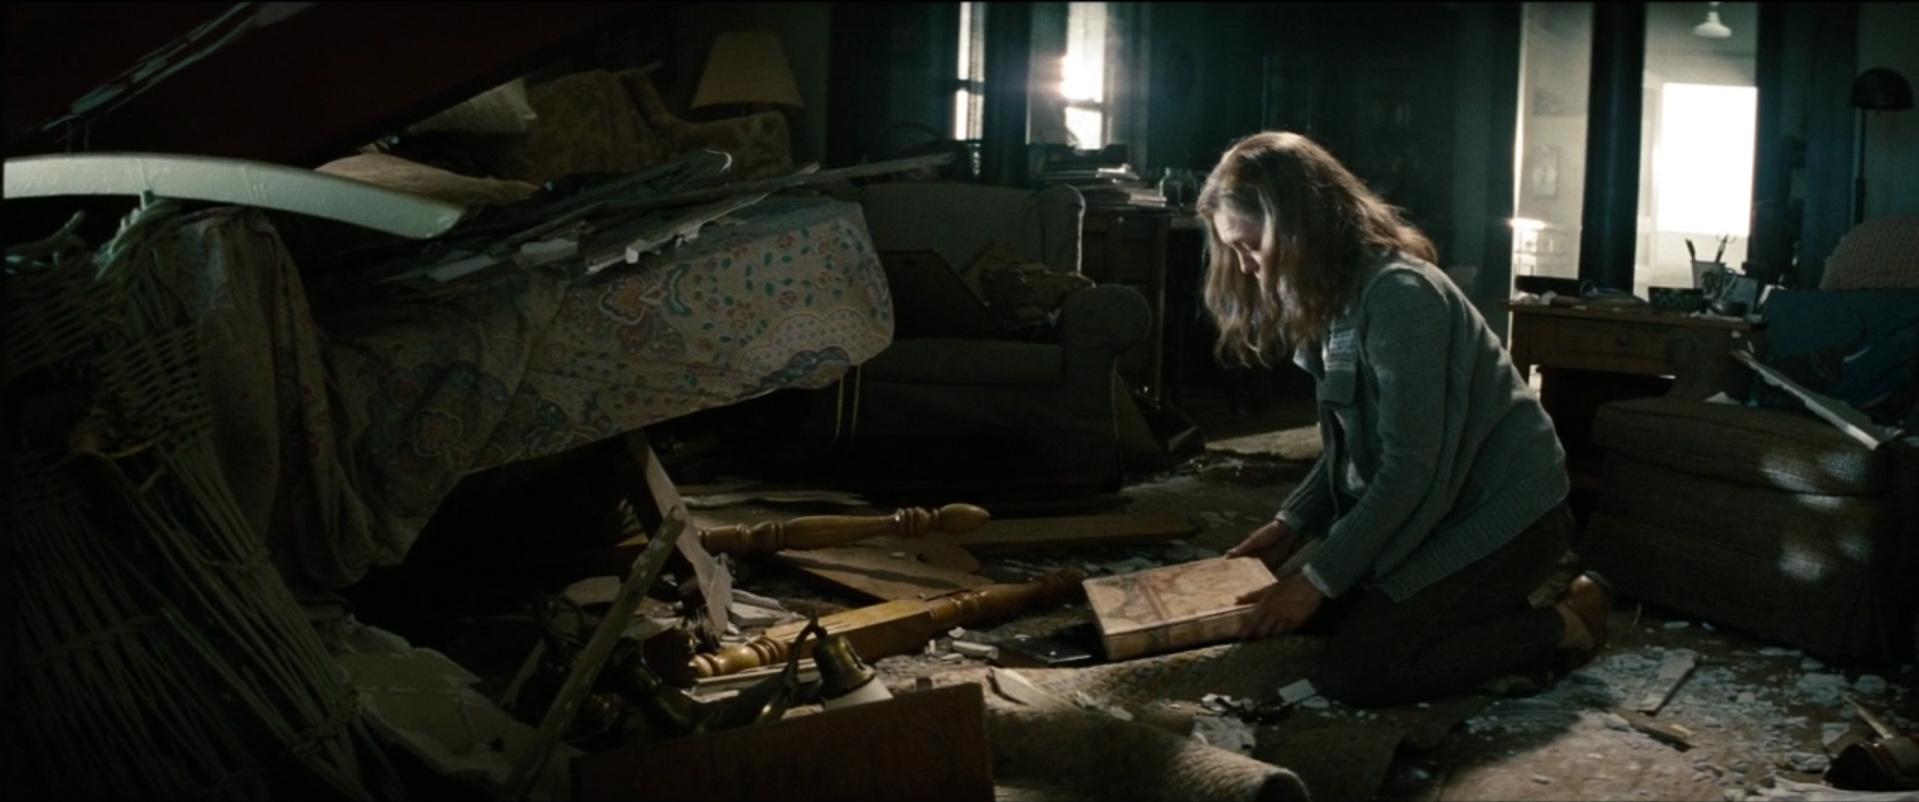 Man of Steel  (2013): terrorists target innocent civilians